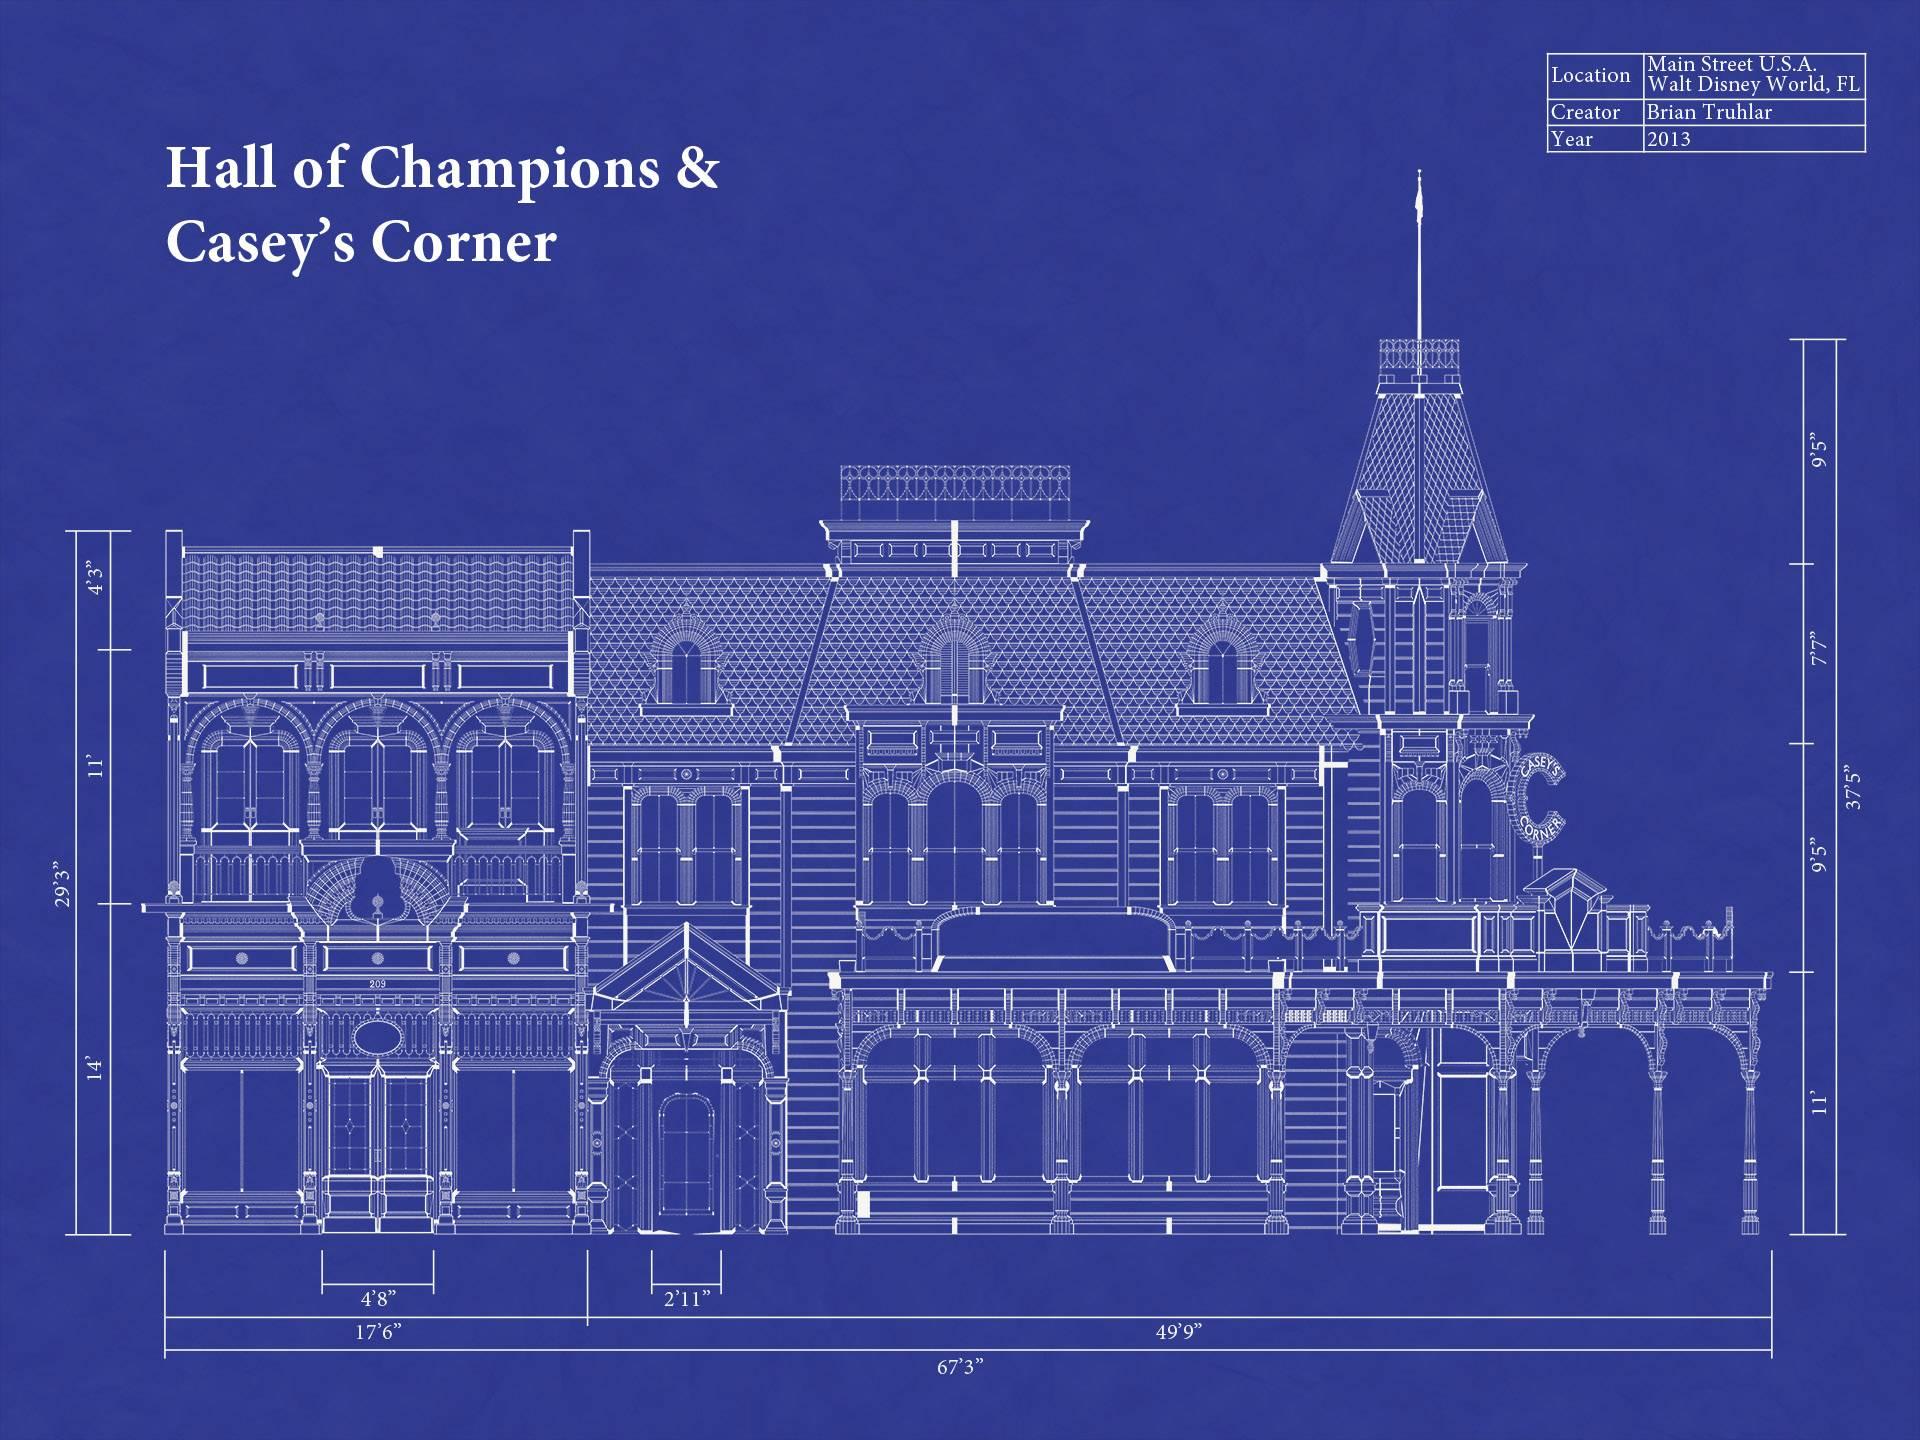 Cinderella Castle Blueprint Galleryhip Hippest Galleries House Plans 11495